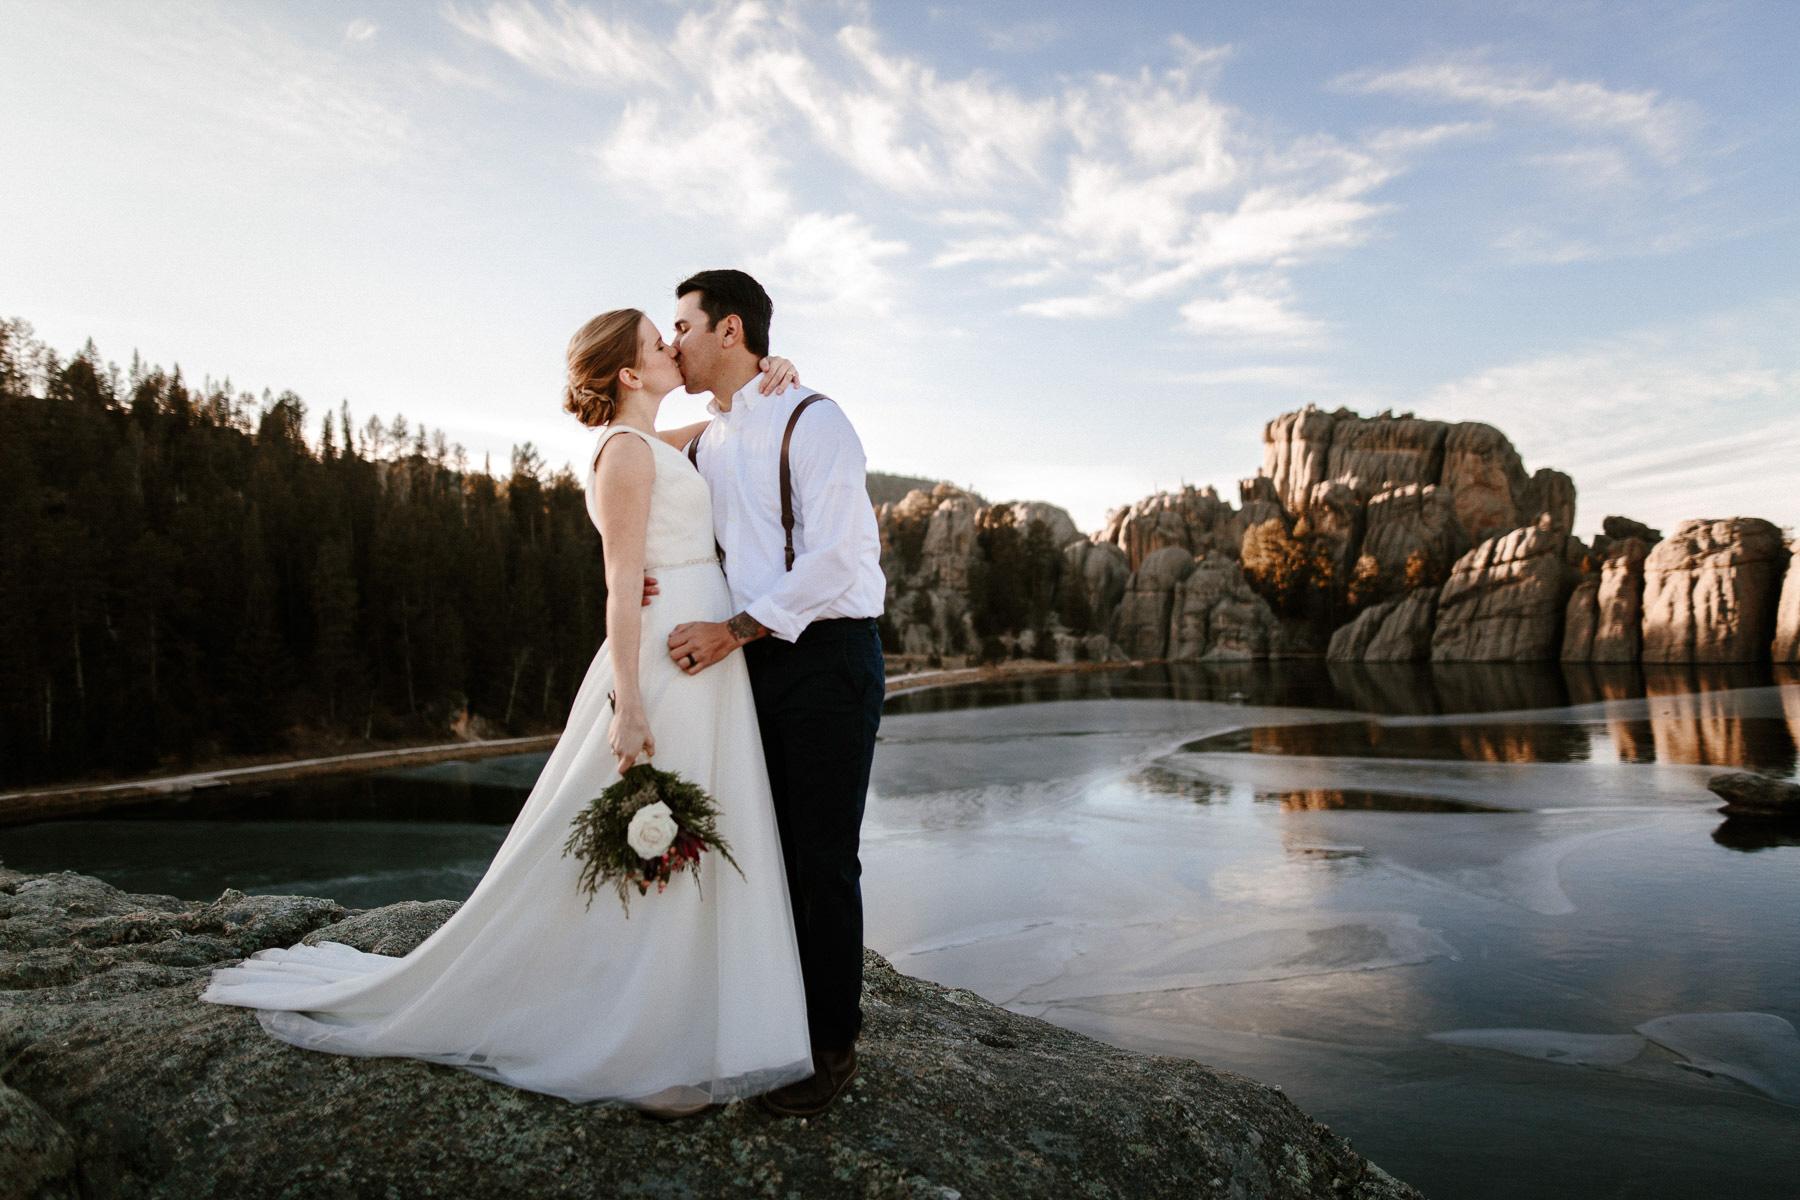 sioux-falls-black-hills-rapid-city-elopement-wedding-adventure-photographer-custer-sylvan-lake-32.jpg